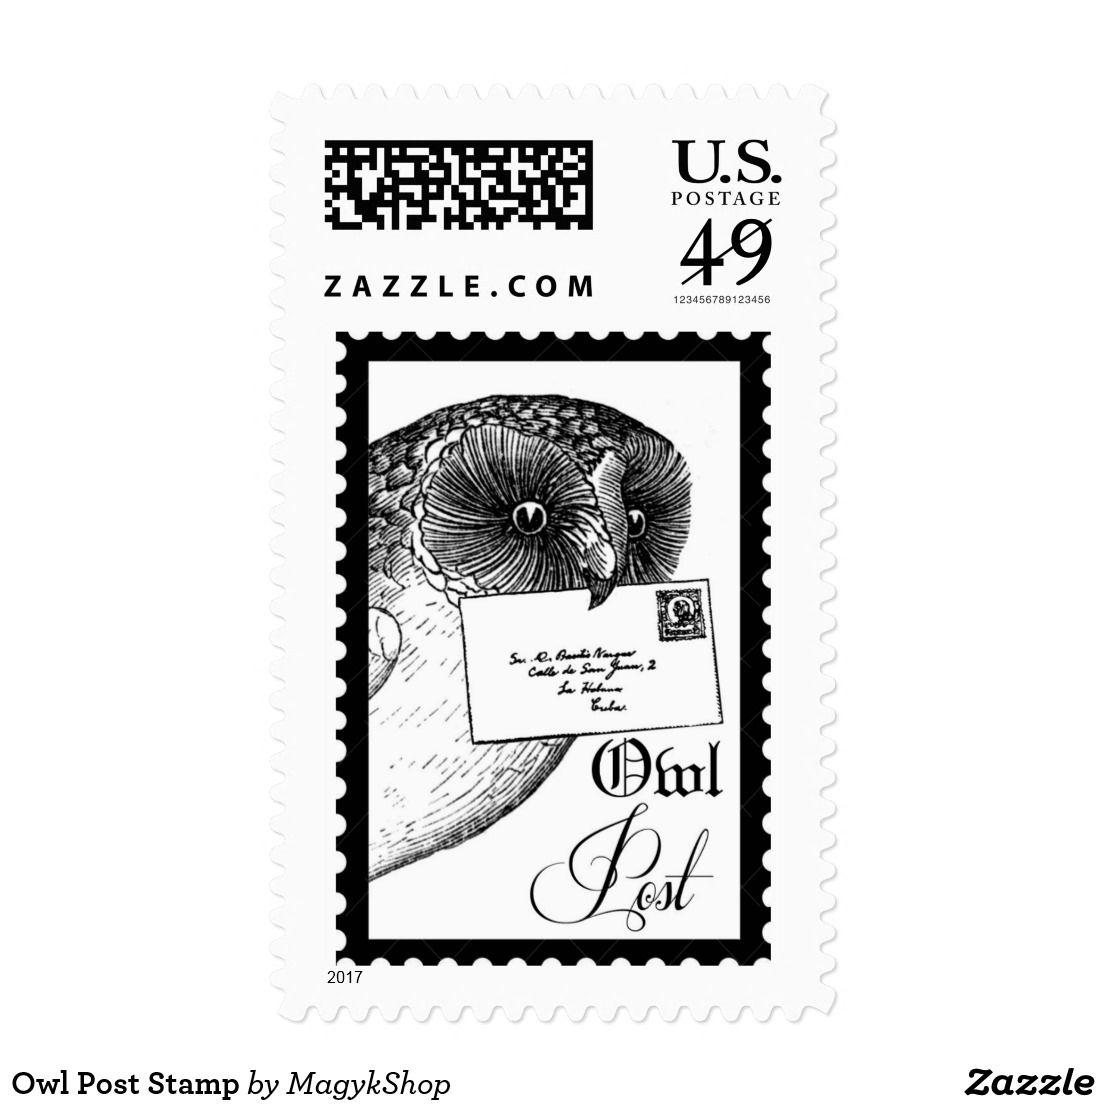 Owl Post Stamp Post Stamp Owl Post Stamp